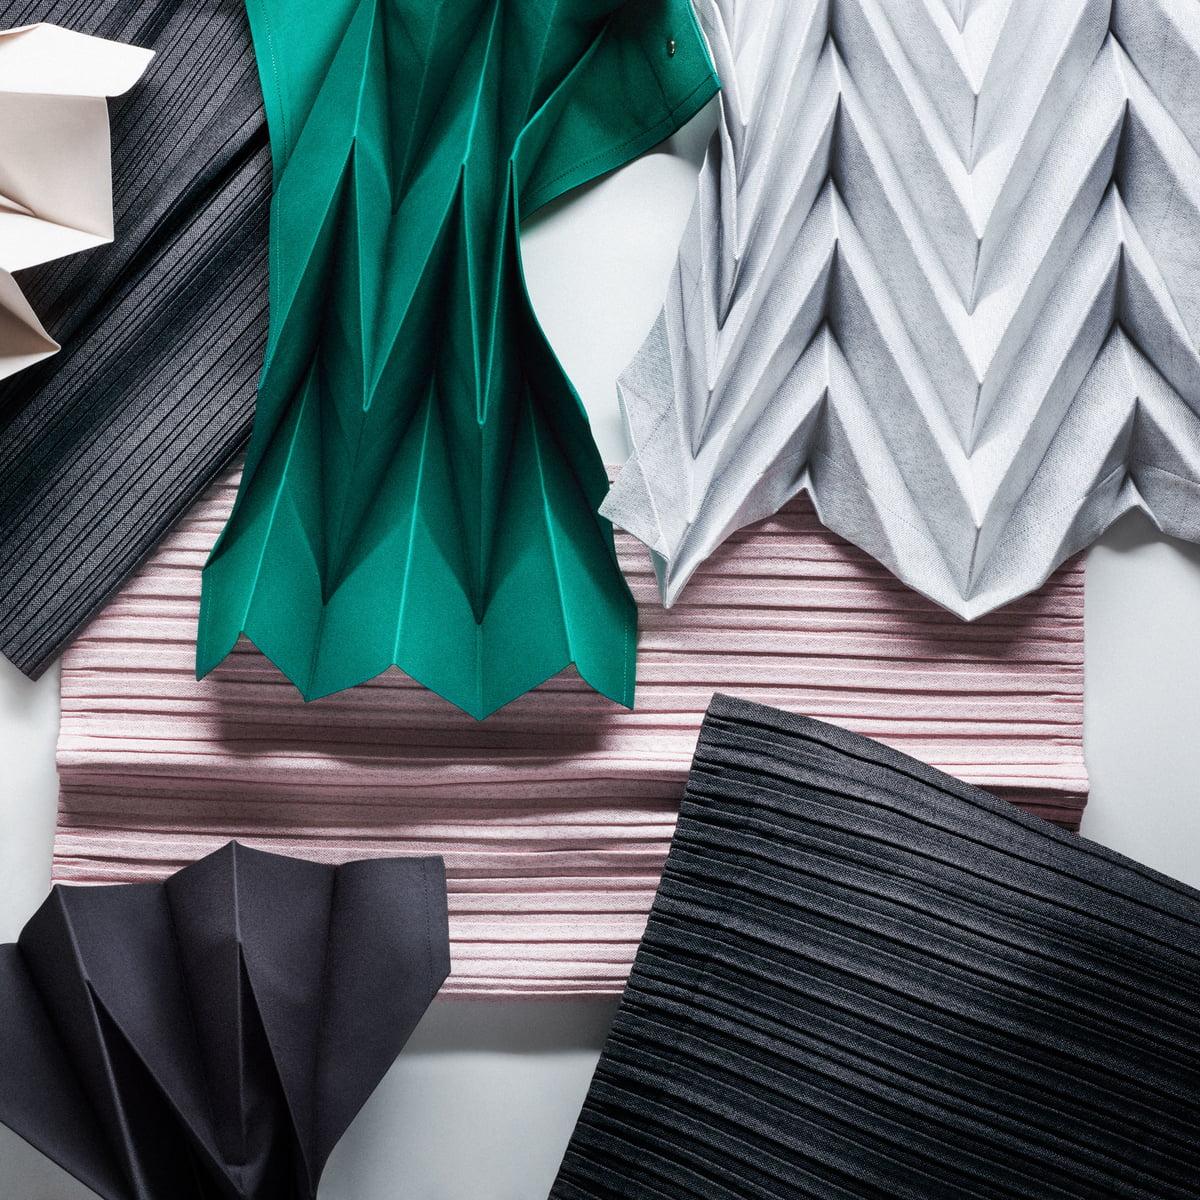 c6ddc502af Iittala X Issey Miyake - home textiles. Iittala X Issey Miyake - Bag 42 x  43 cm